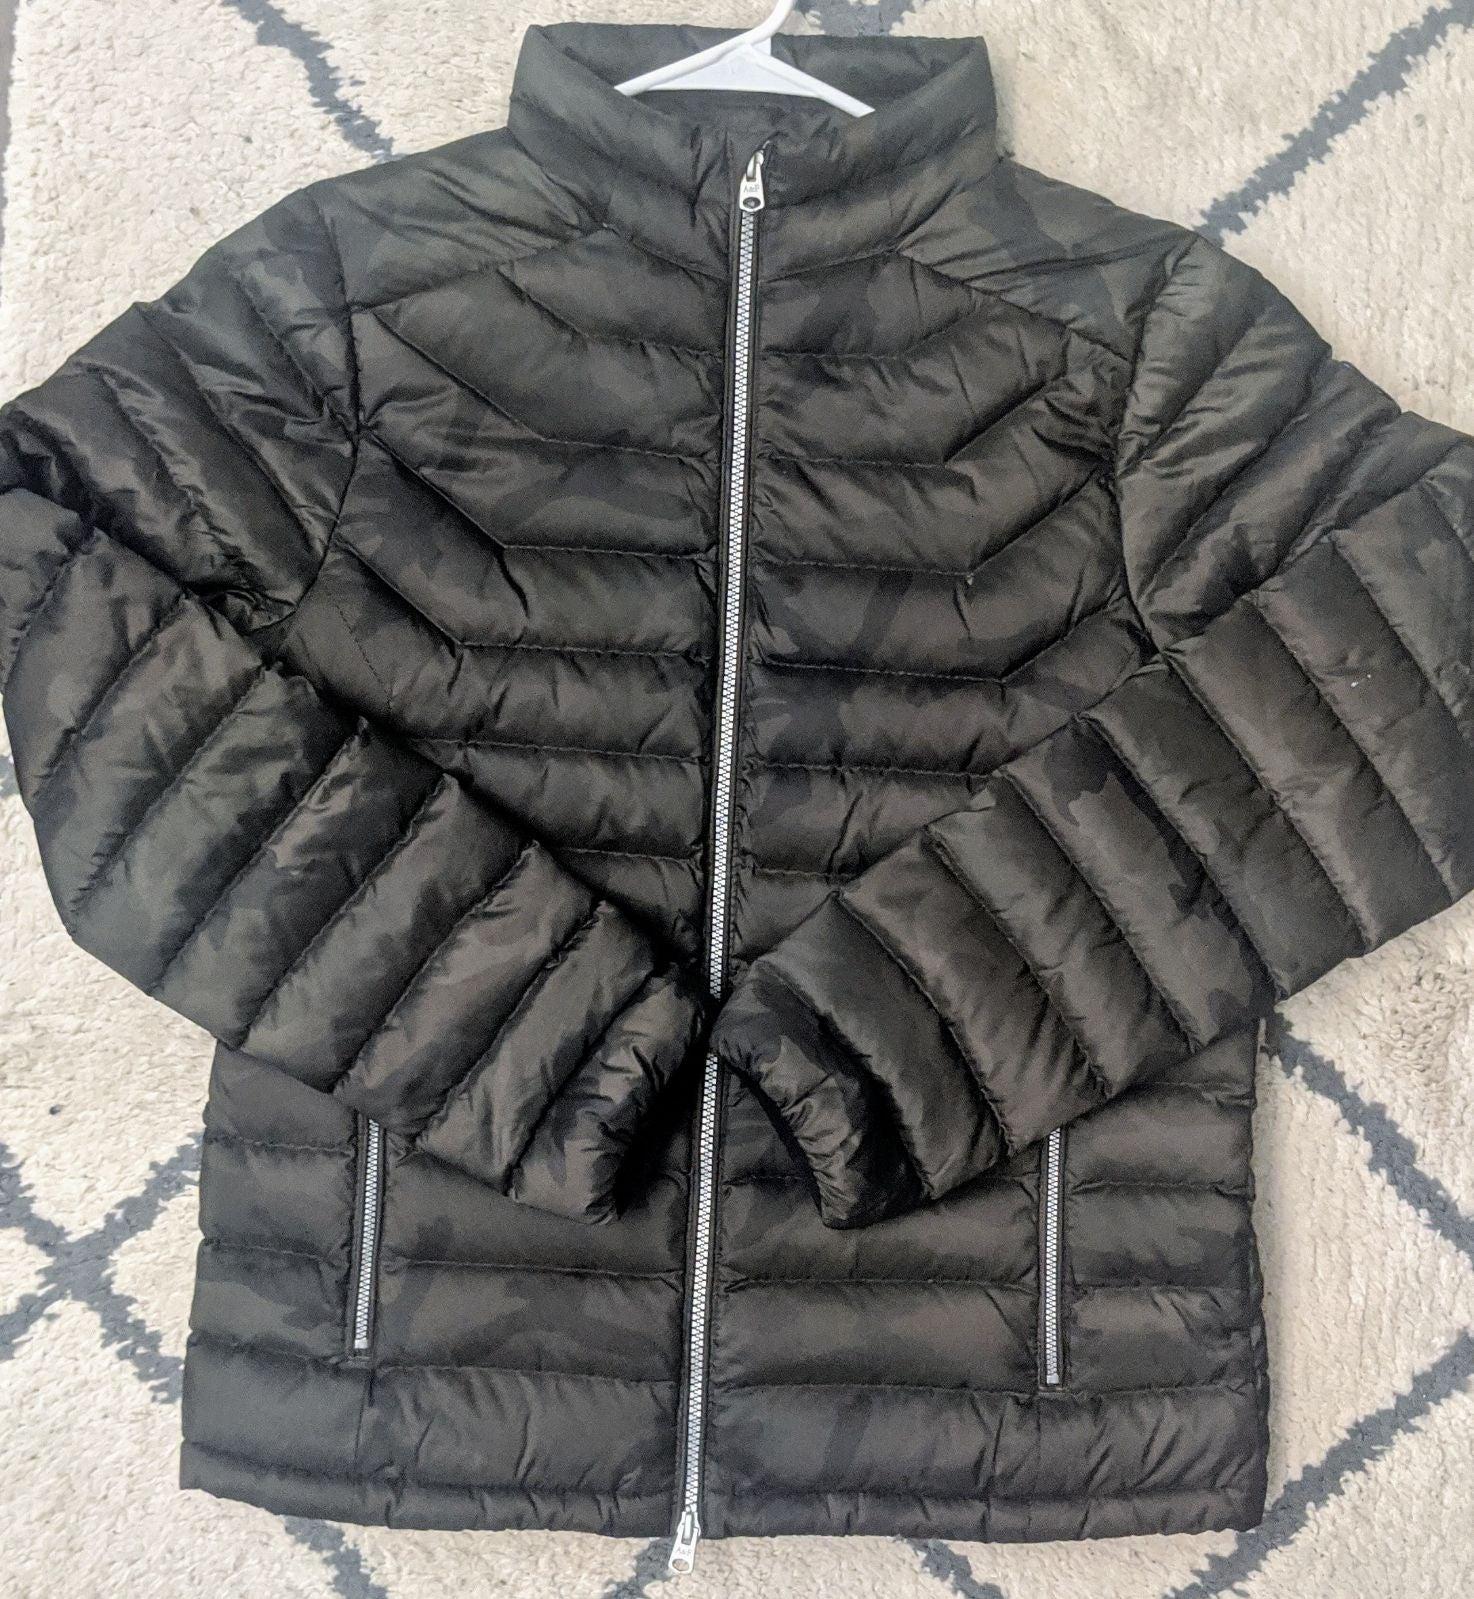 Abercrombie & Fitch Camo Down Jacket